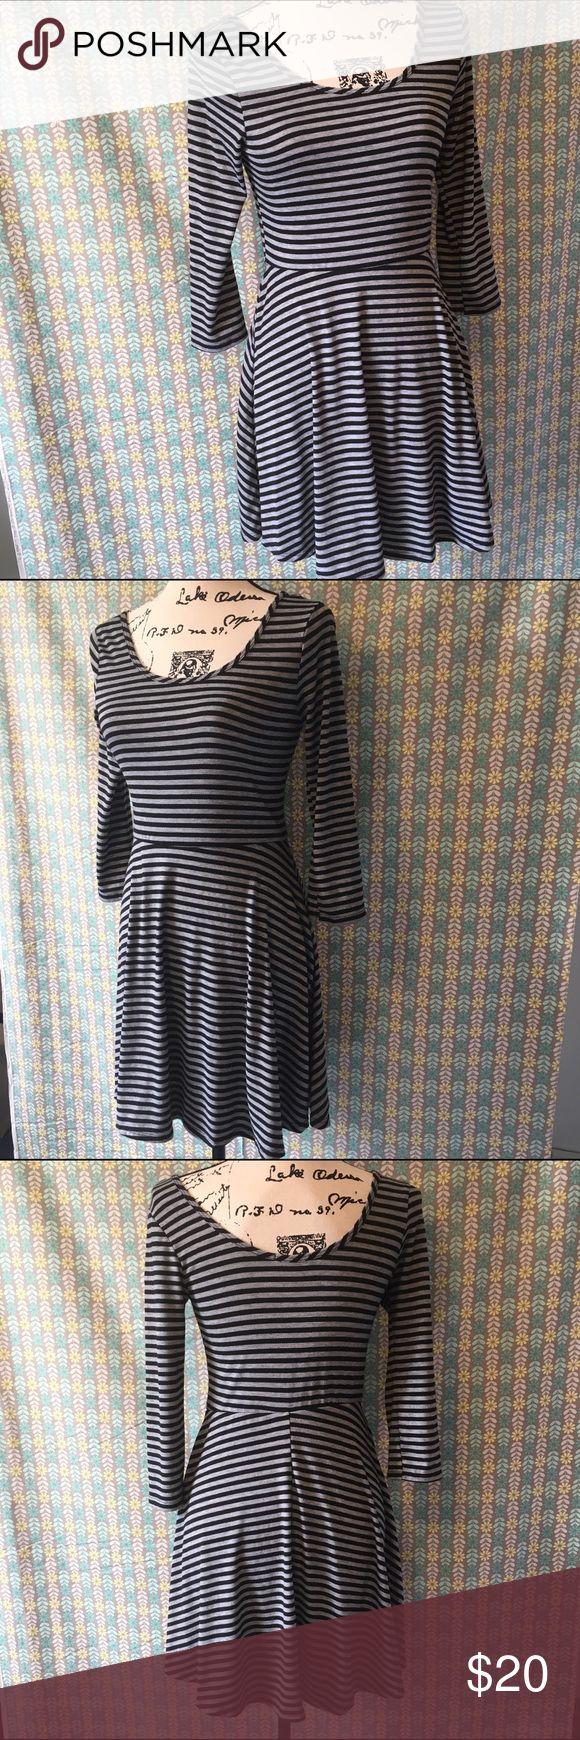 Delias skater dress. Medium Delias scoop neck skater dress. 3/4 sleeves with Black and grey stripes. Light rayon fabric with spandex waistband. Delias Dresses Mini